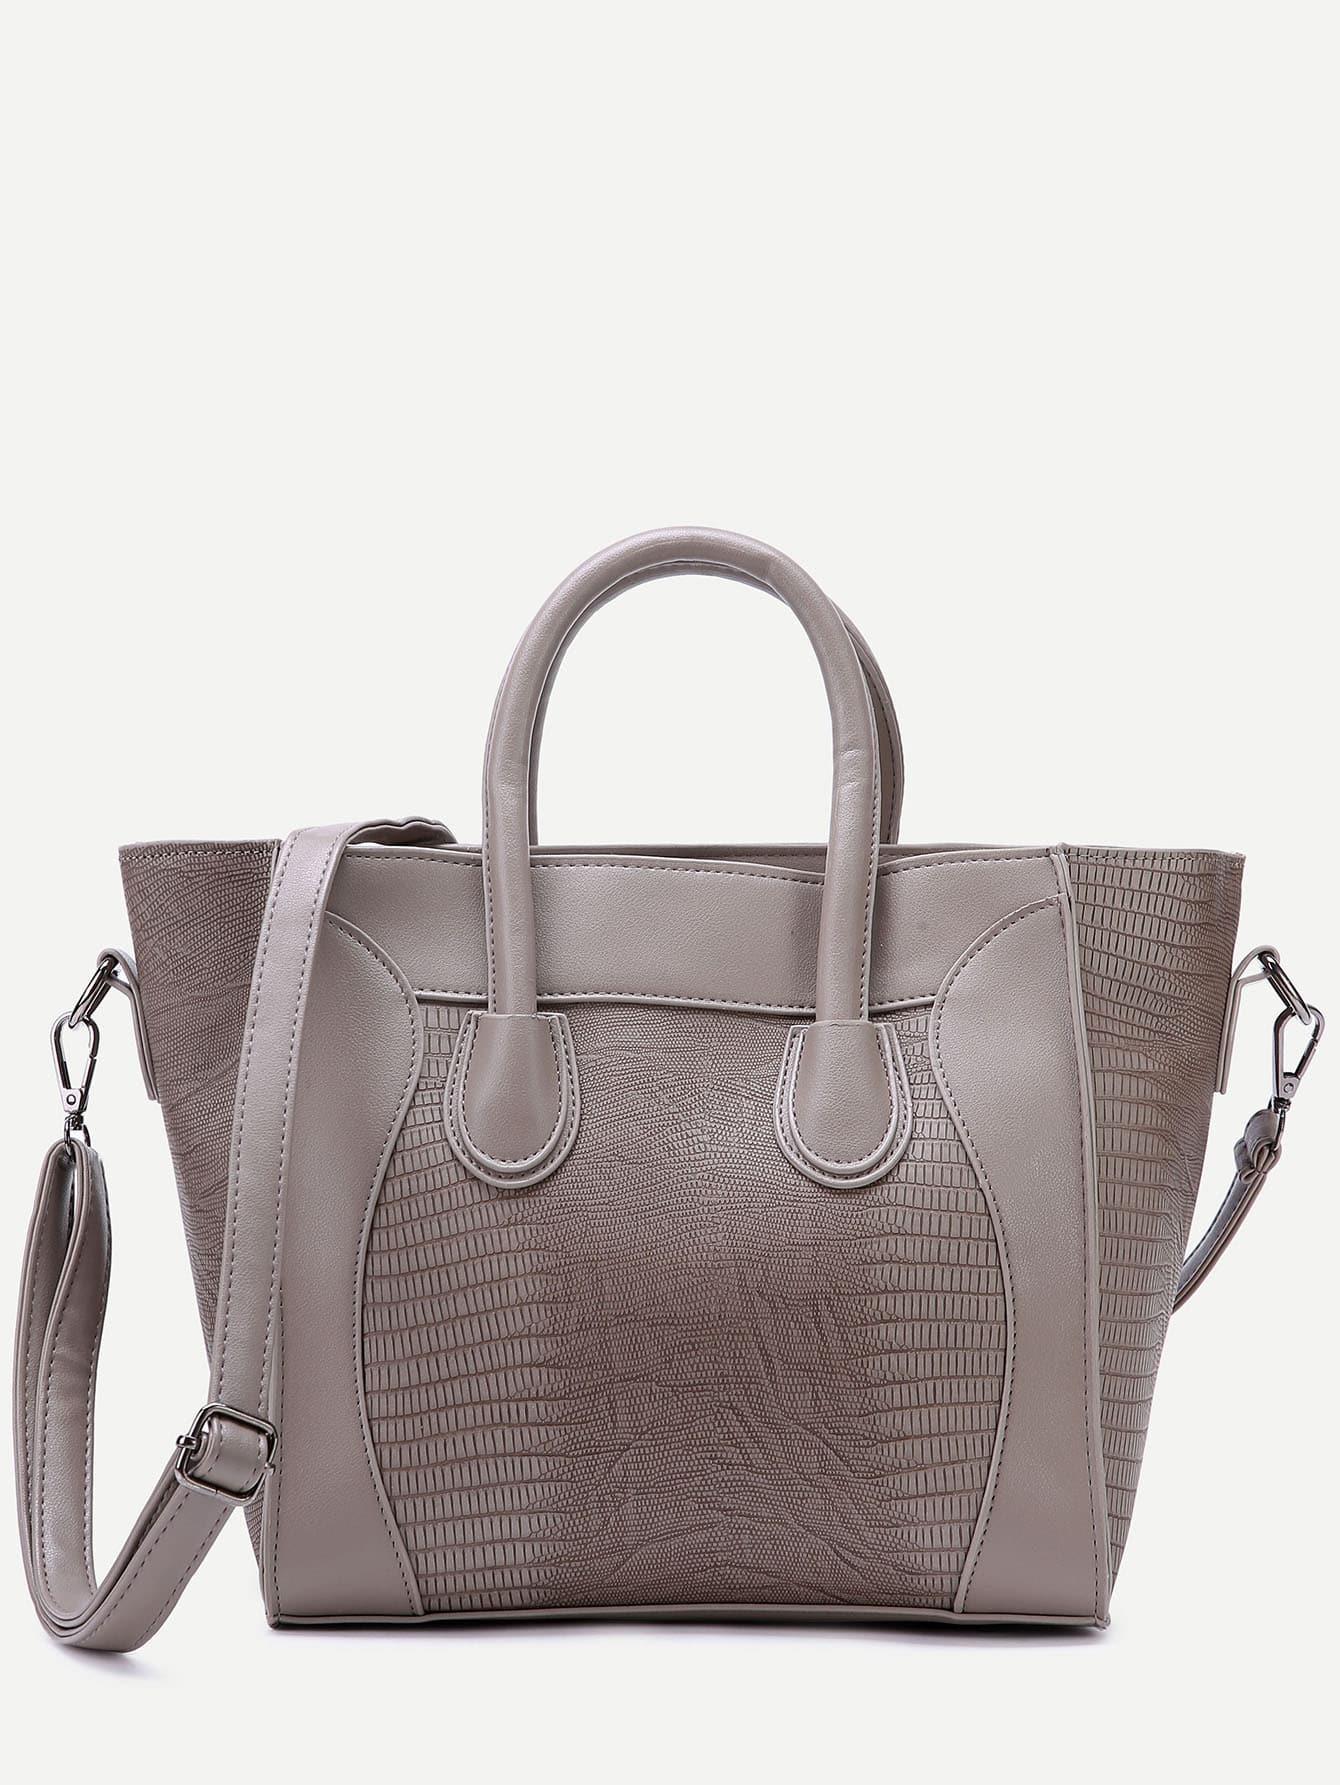 bag160907307_1